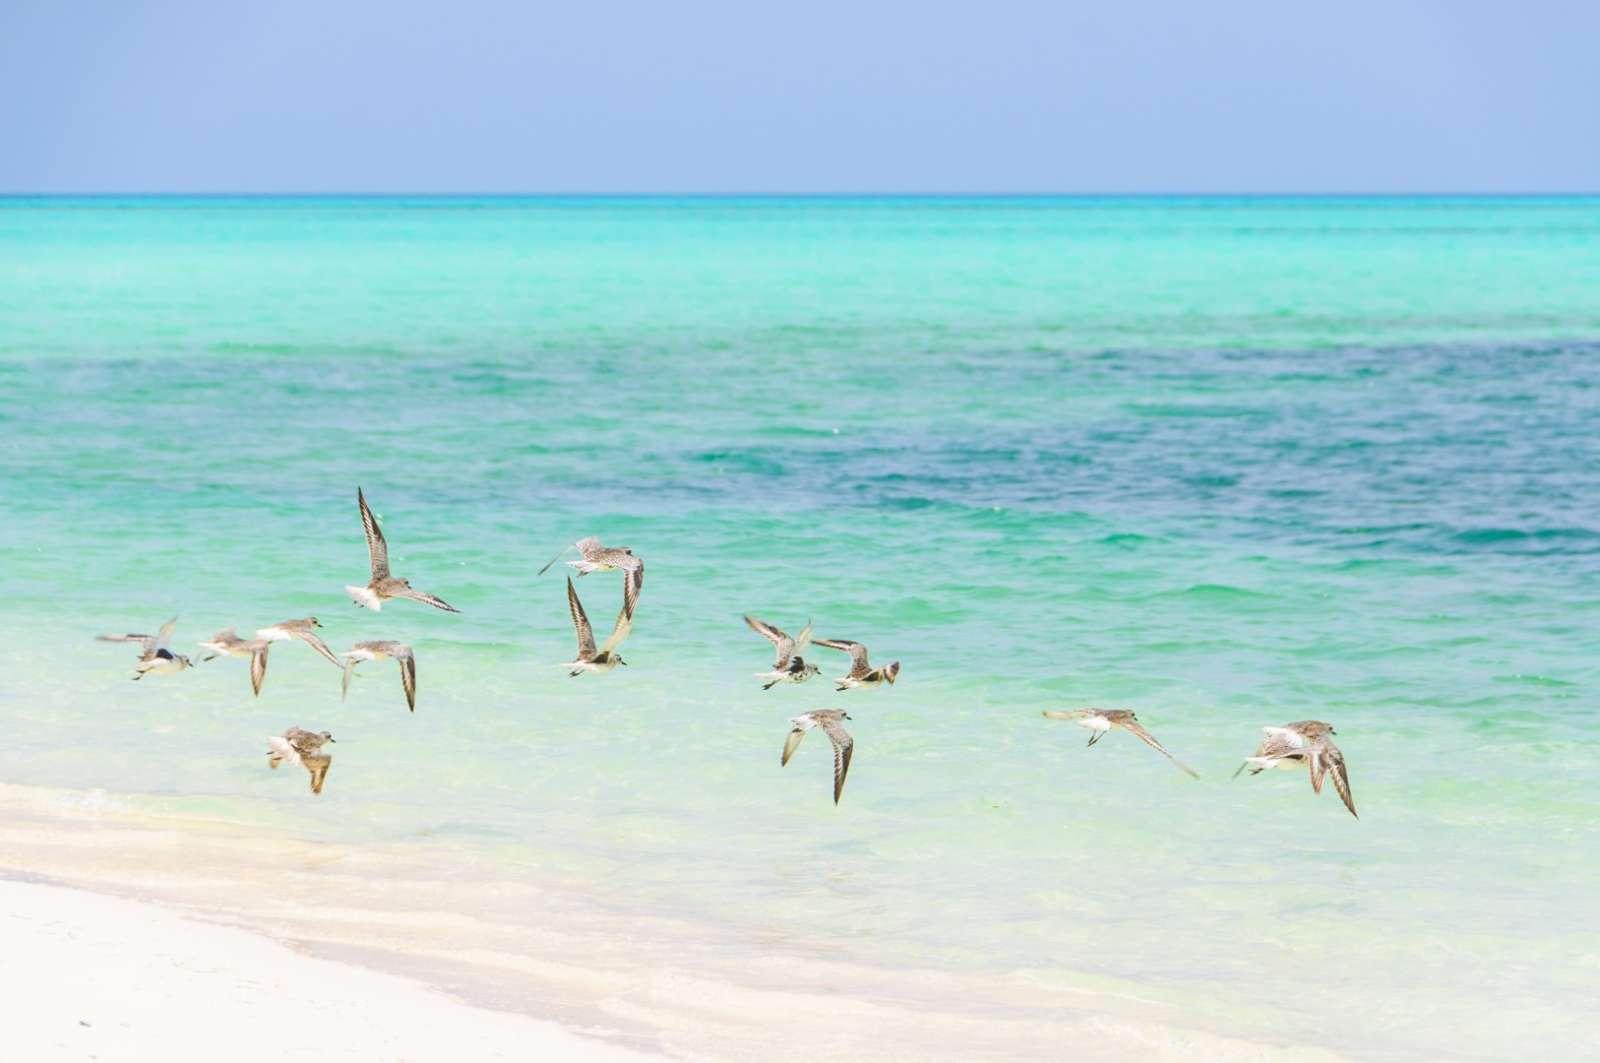 Flock of flying birds on Cayo Levisa, Cuba